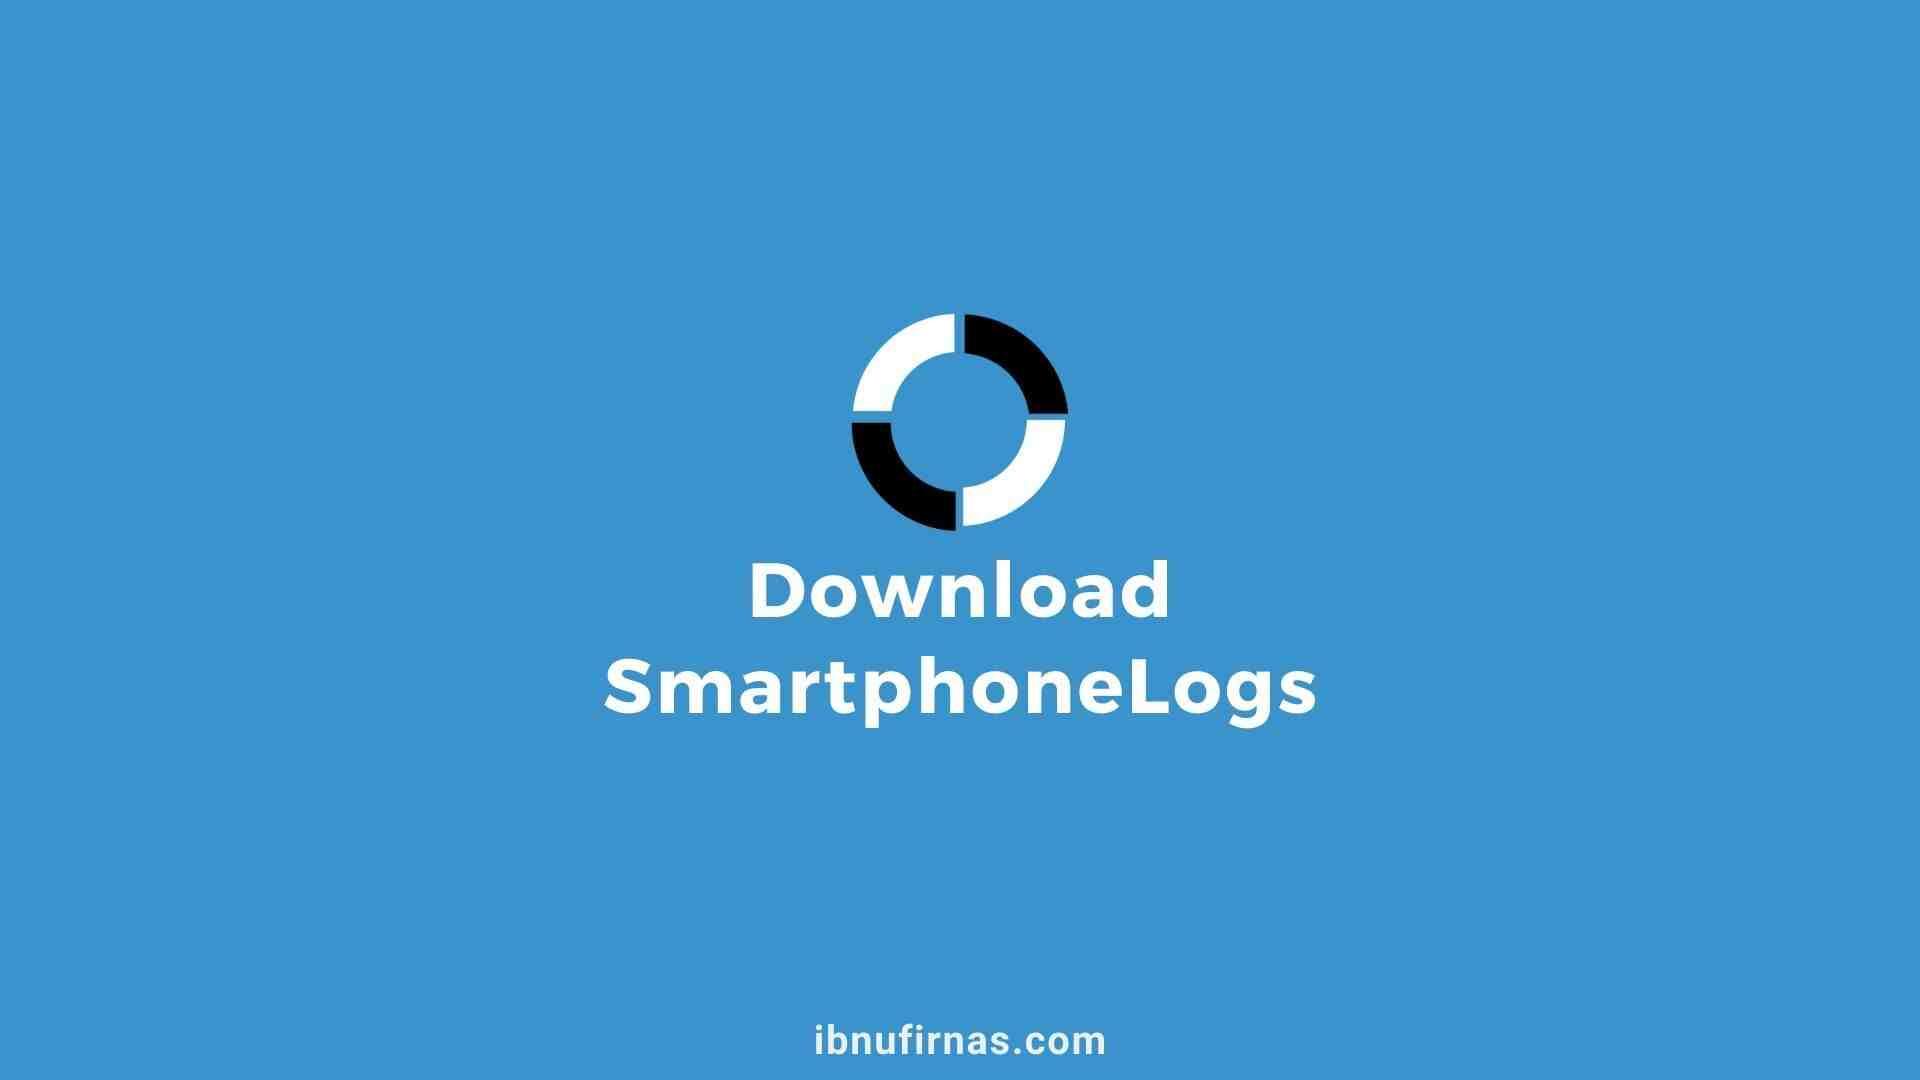 Aplikasi Smartphonelogs